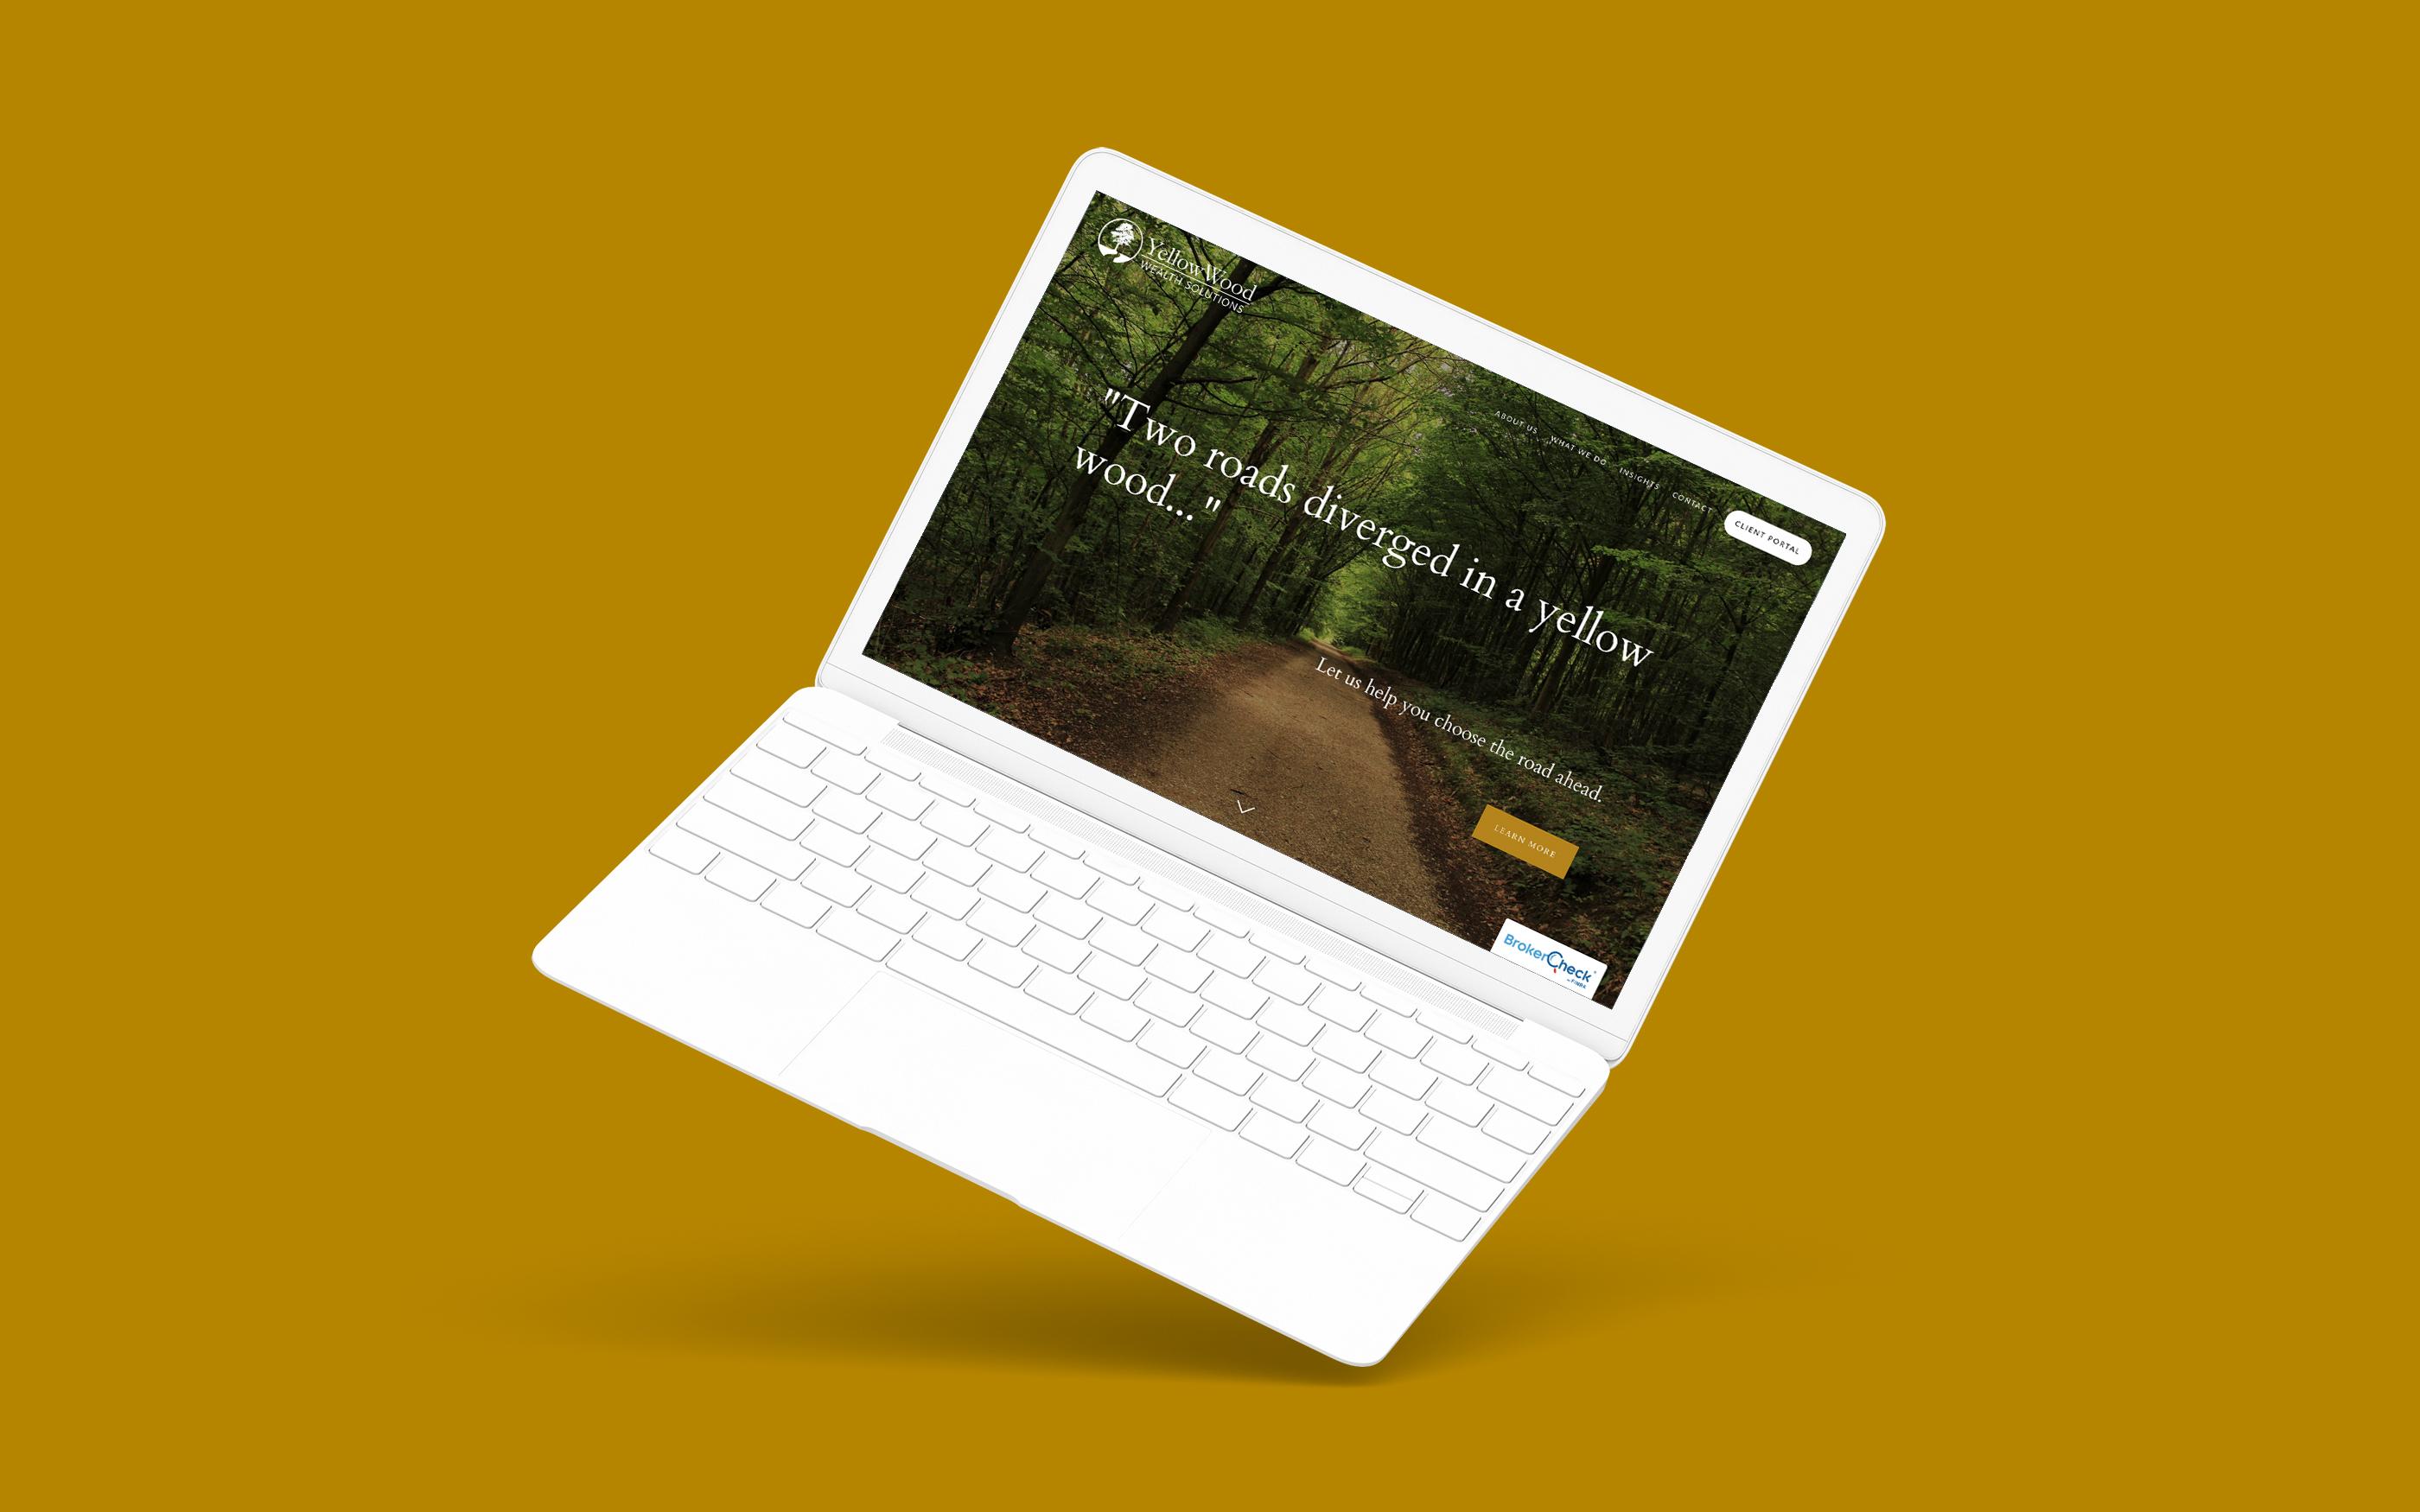 yellowwood wealth solutions best financial advisor website designed by twenty over ten